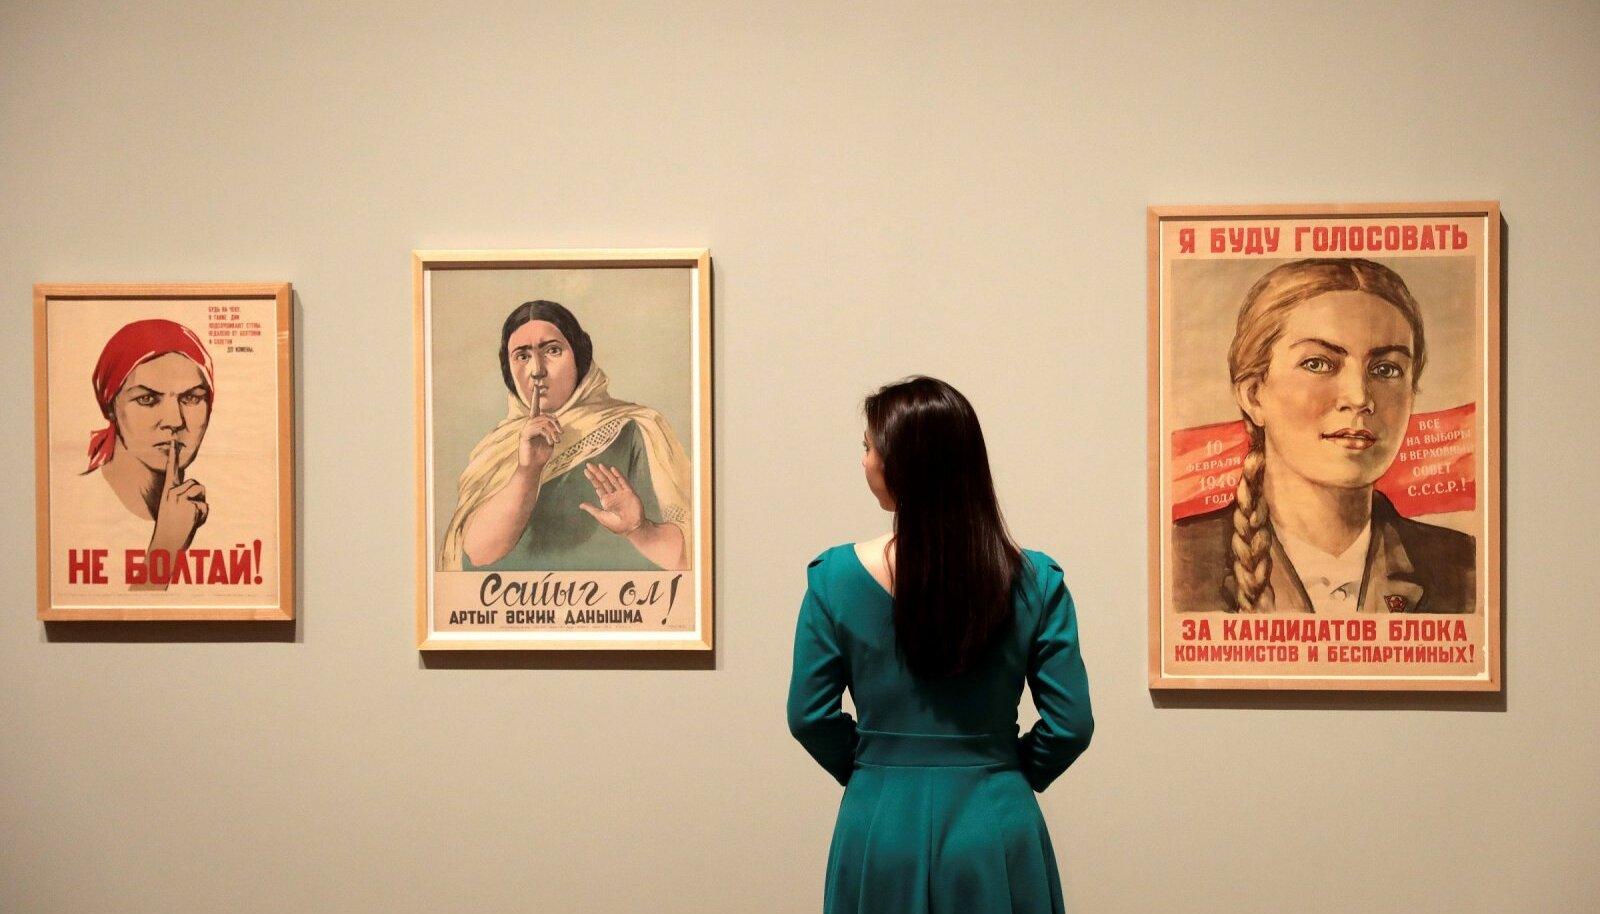 Nõukogude propagandanäitus Londonis